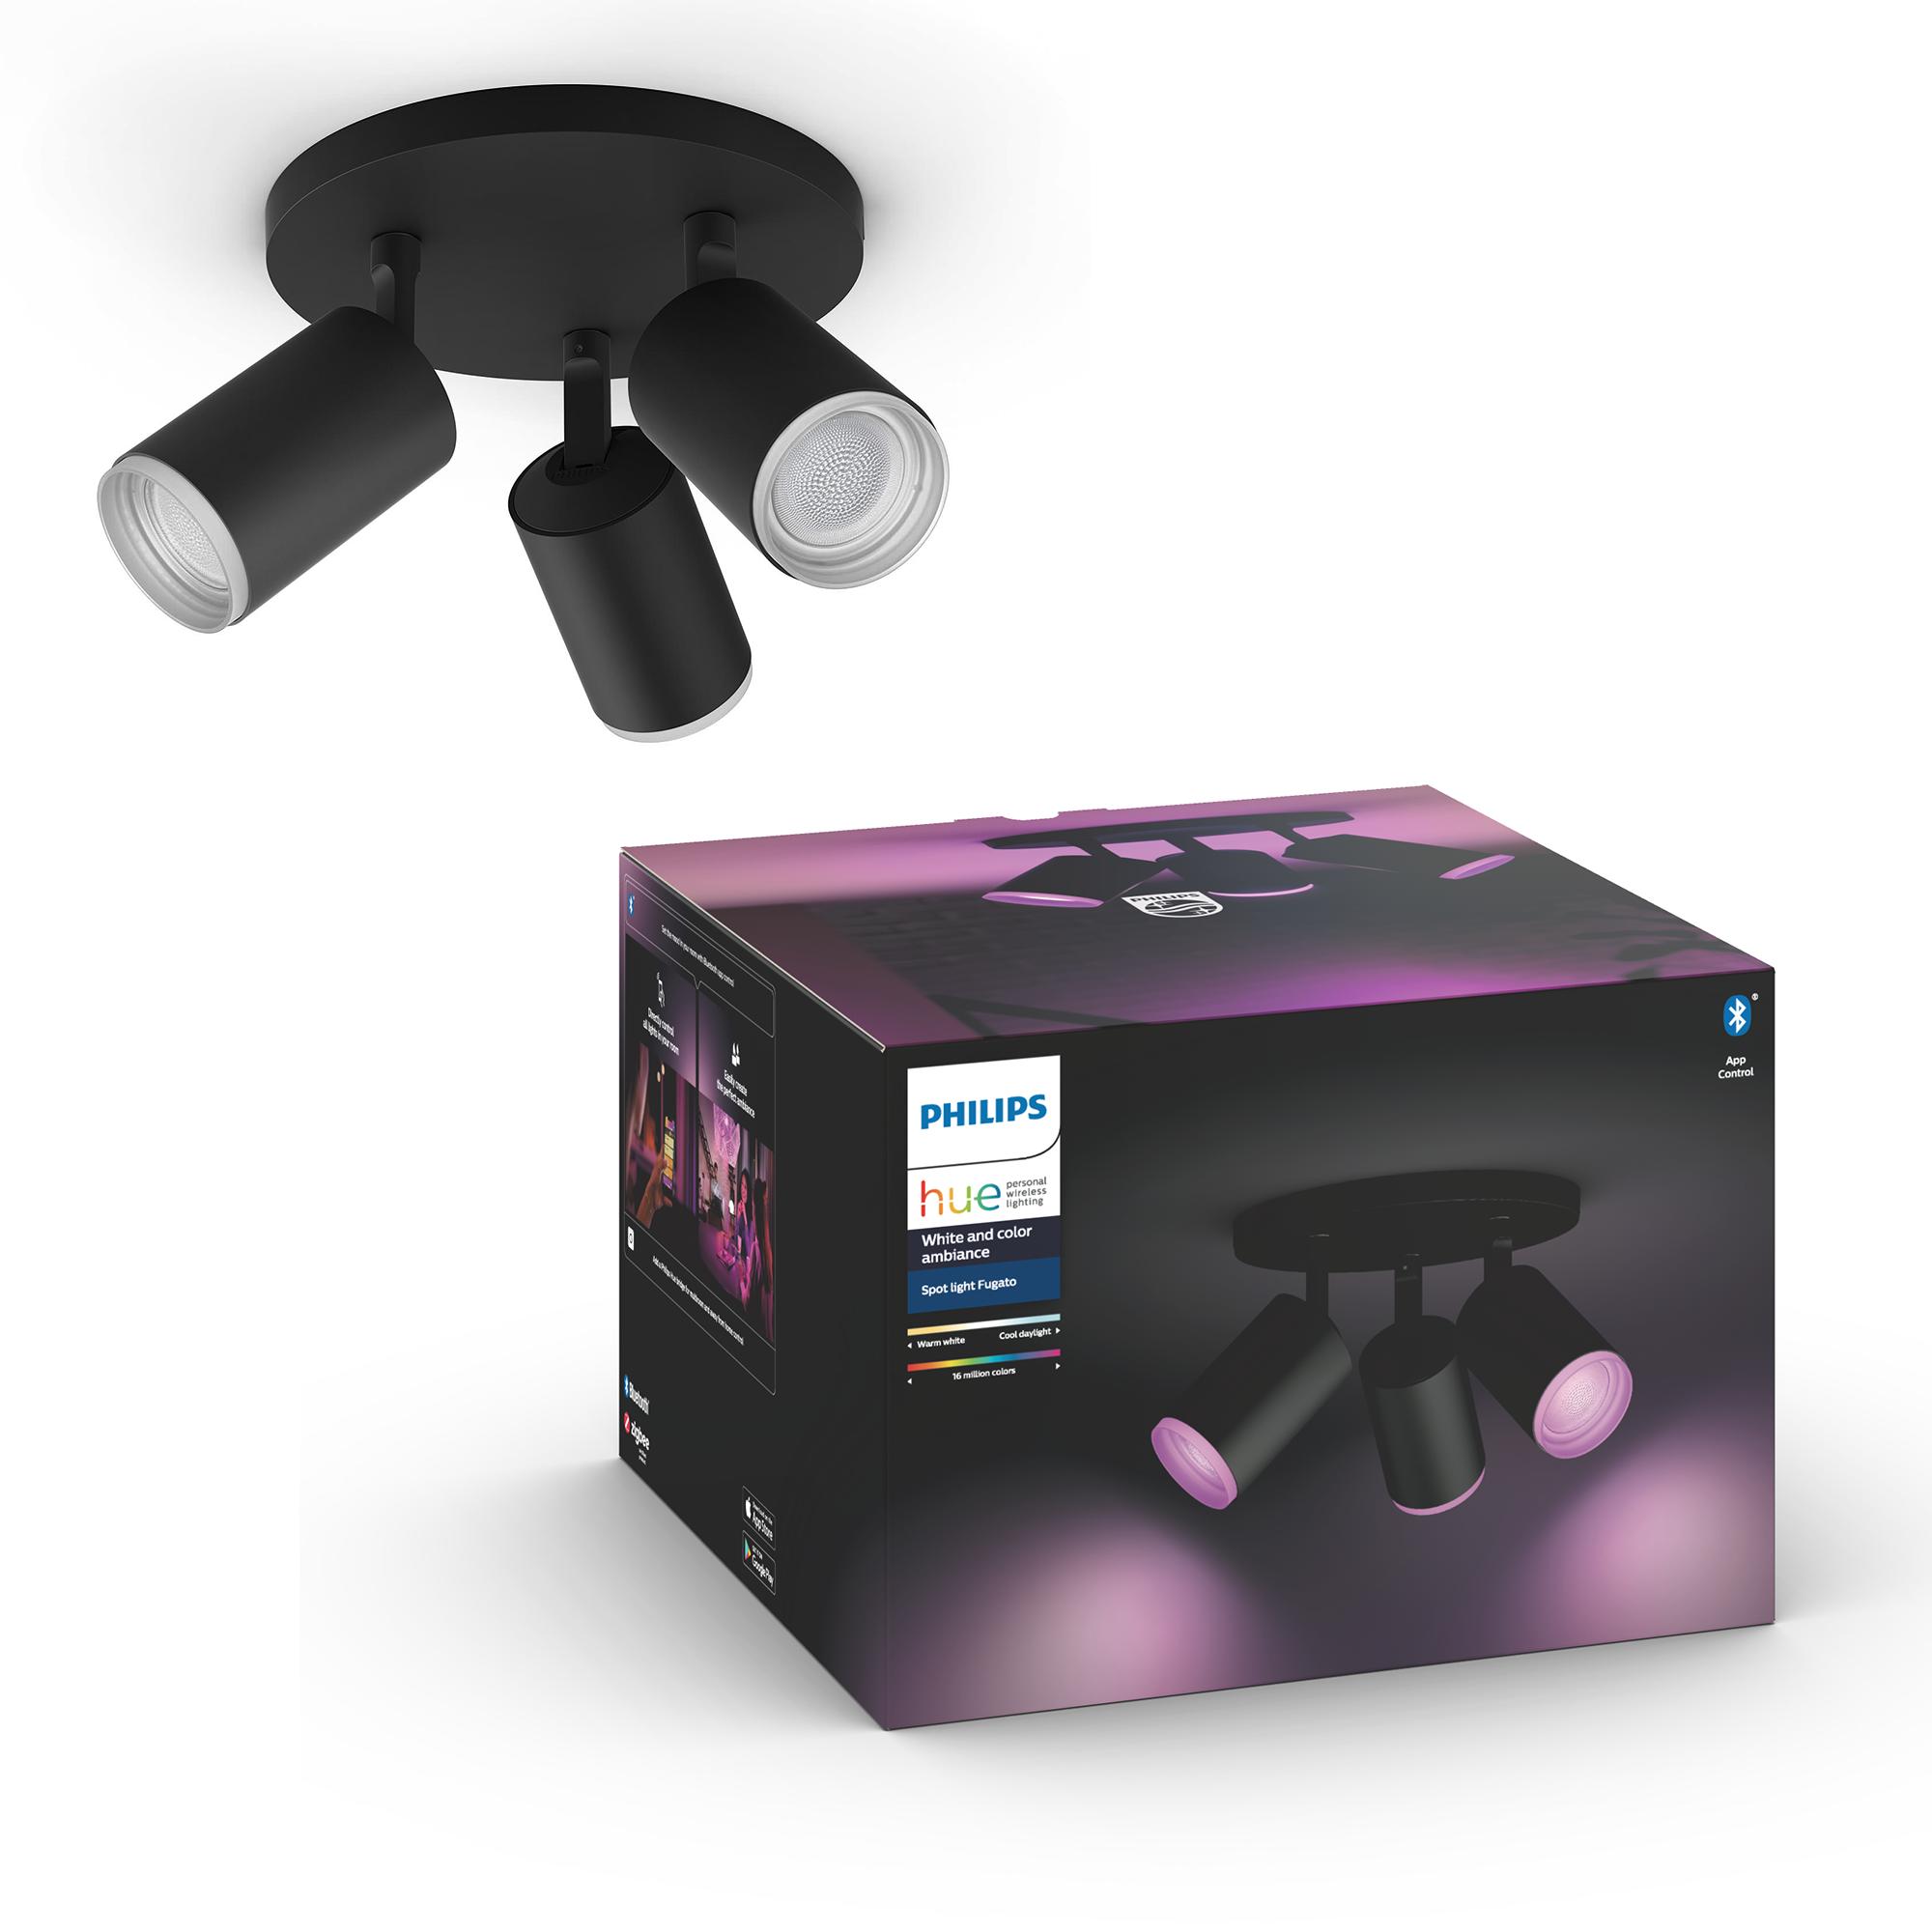 Philips Hue - Fugato 3-Spot Black - White & Color Ambiance - Bluetooth